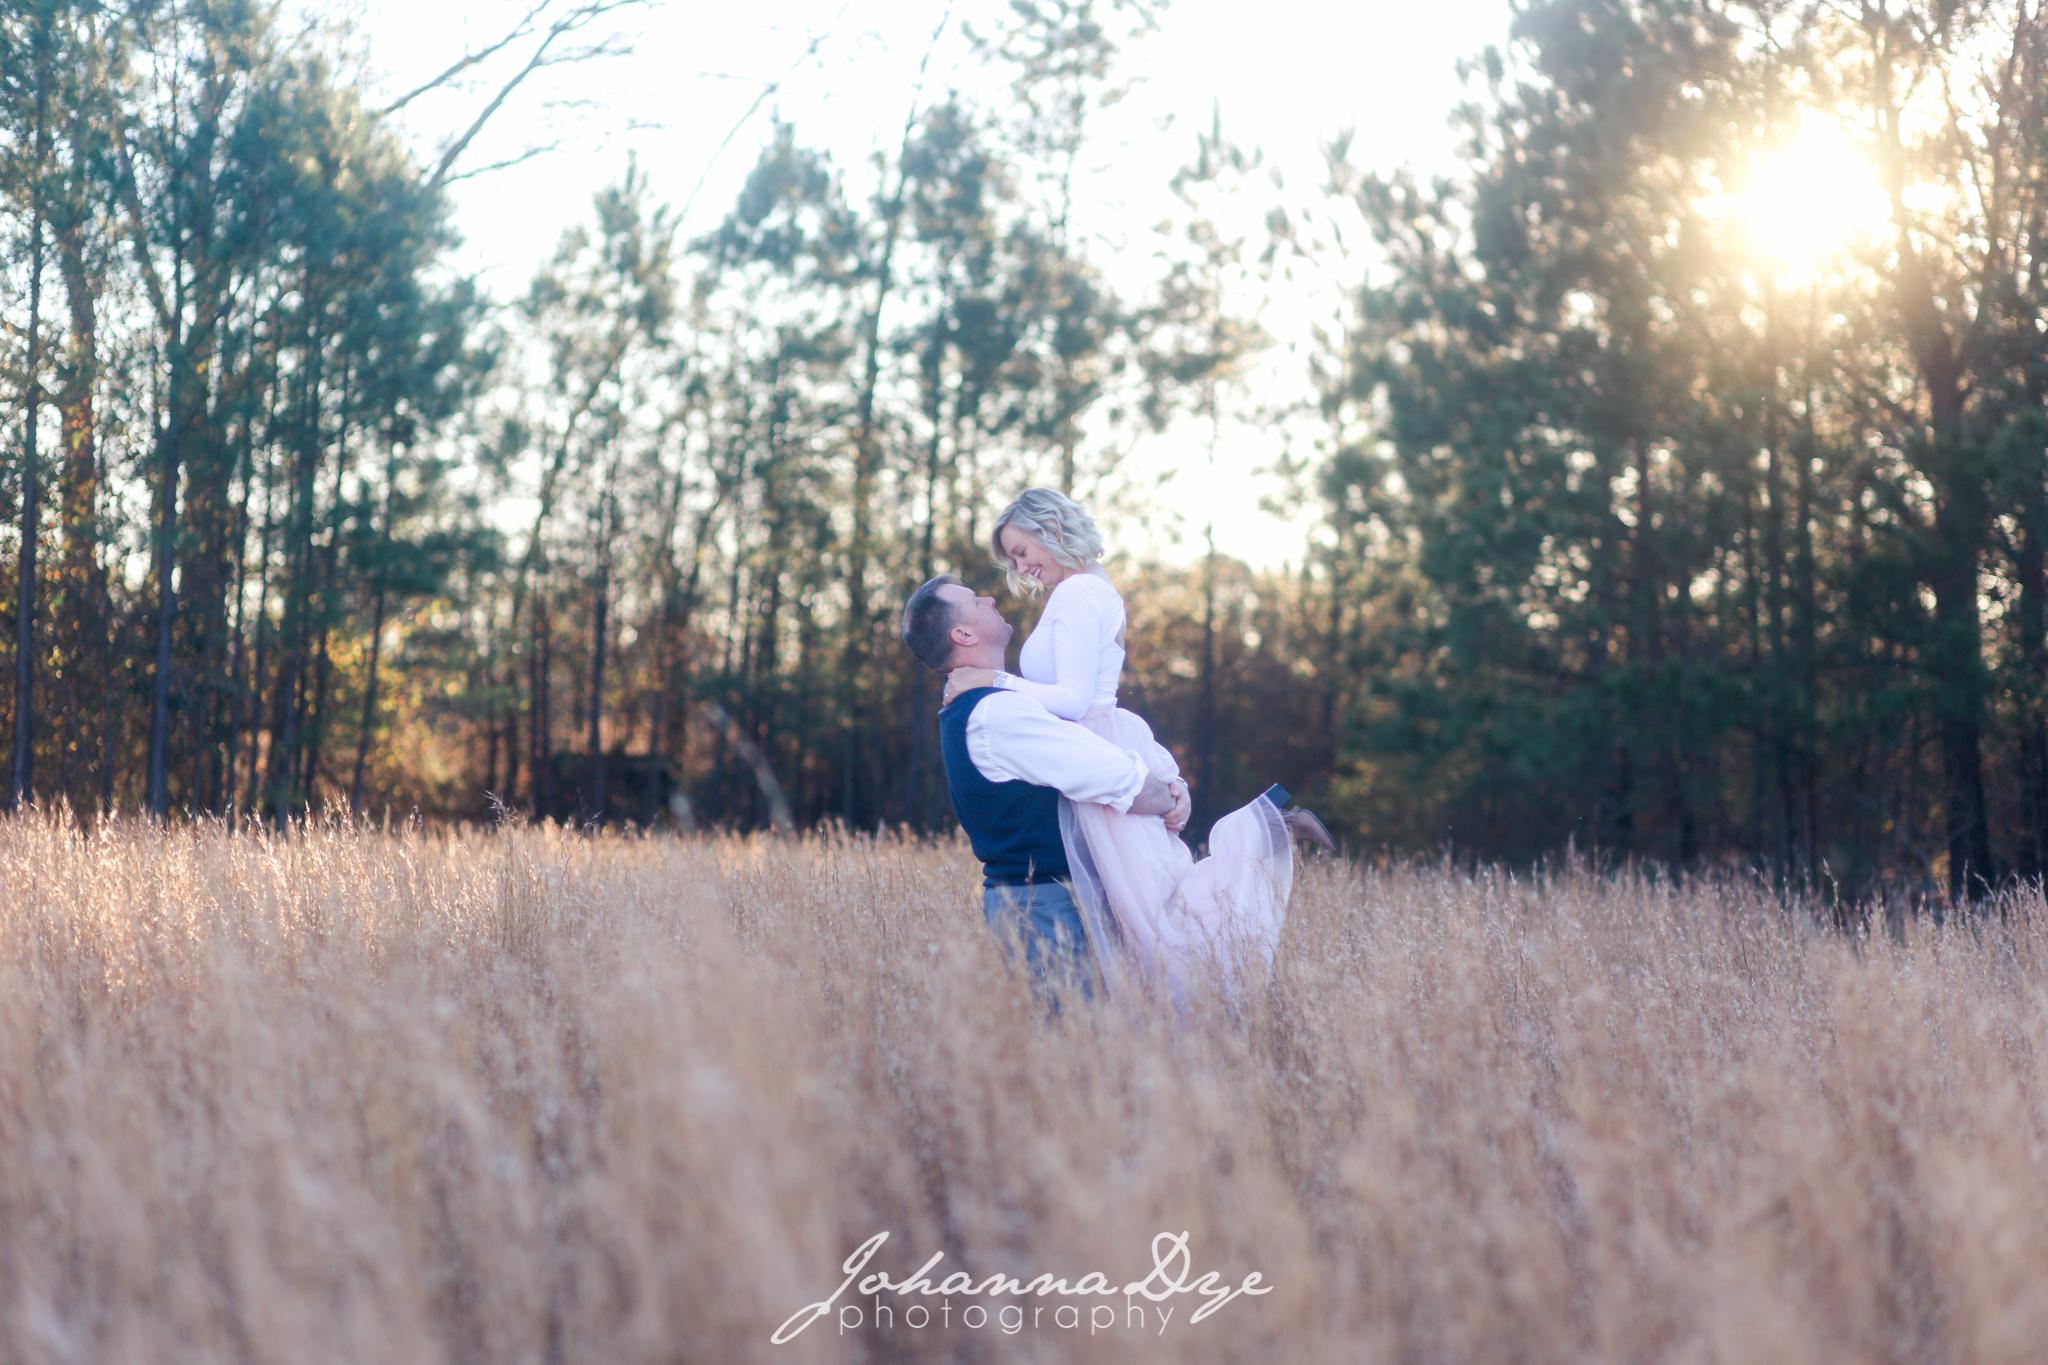 JohannaDyePhotography_Web-22.jpg